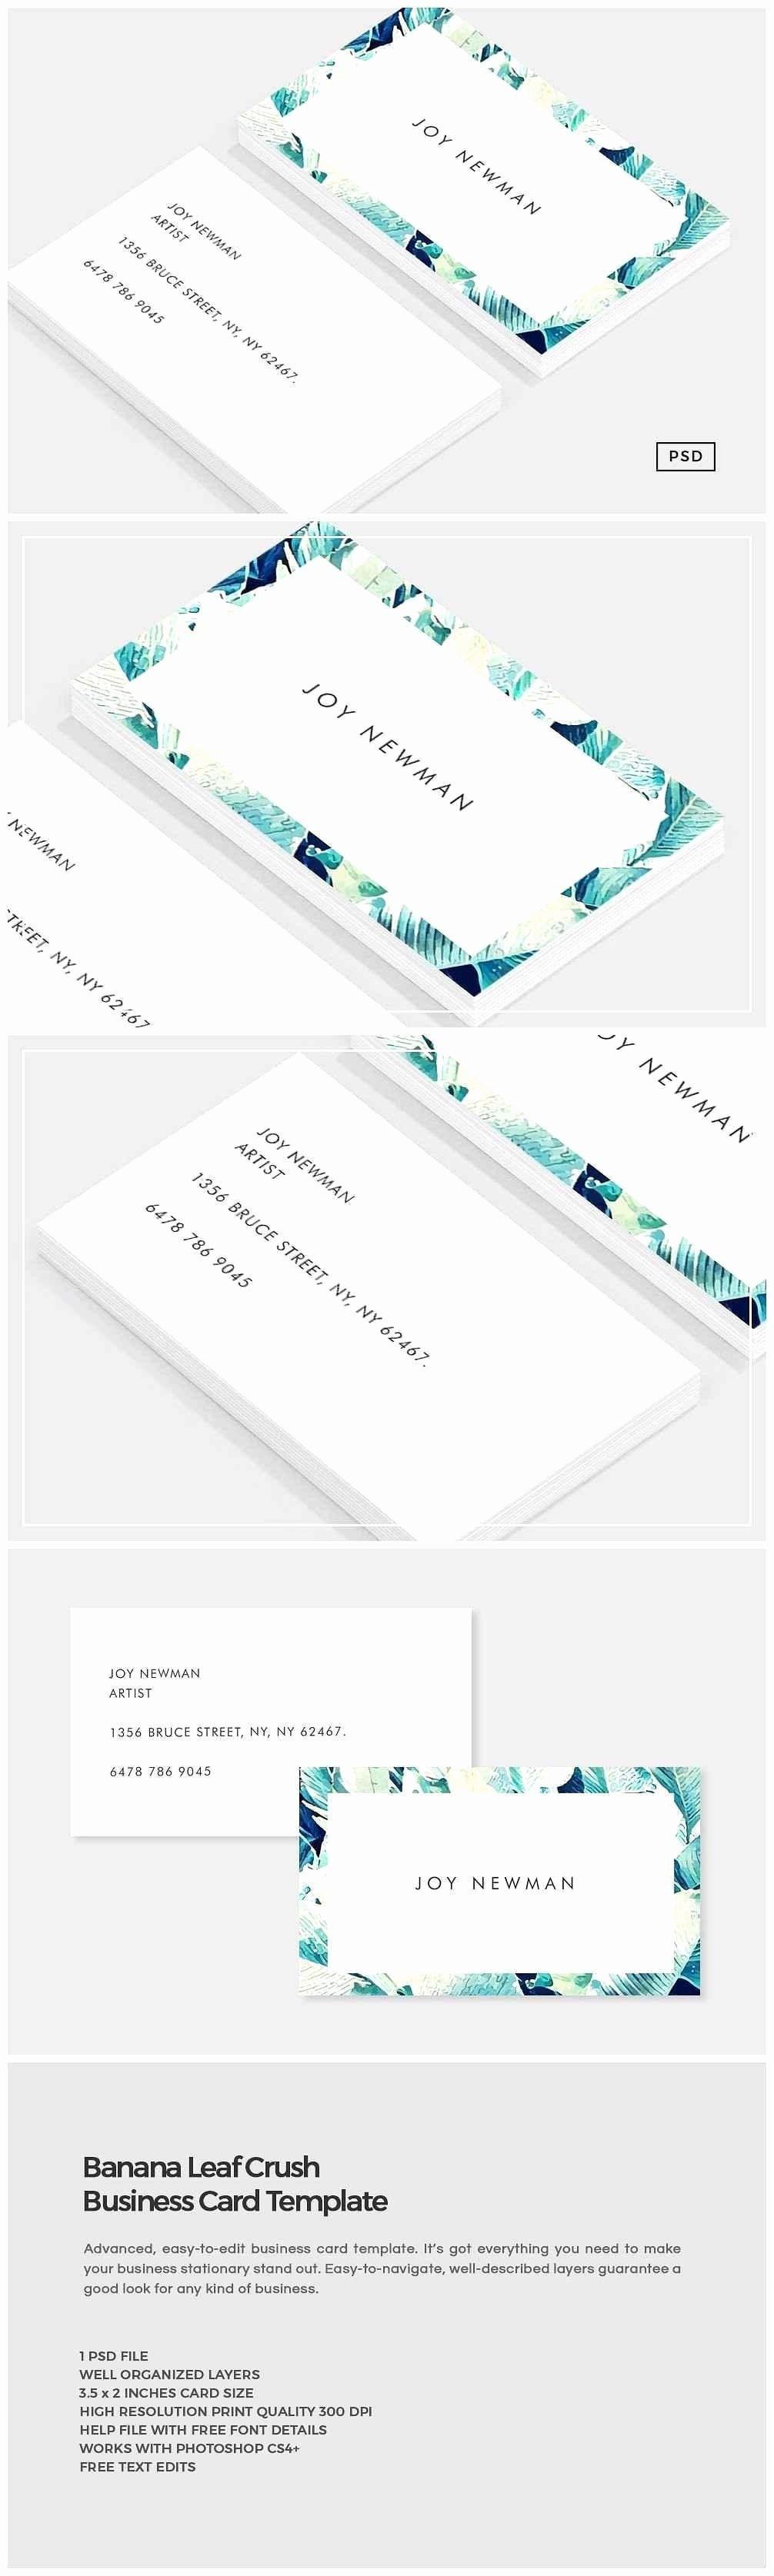 Business Card Size Photoshop Template 10 Professional Throughout Business Card Template Size Pho Business Card Inspiration Unique Business Cards Card Design